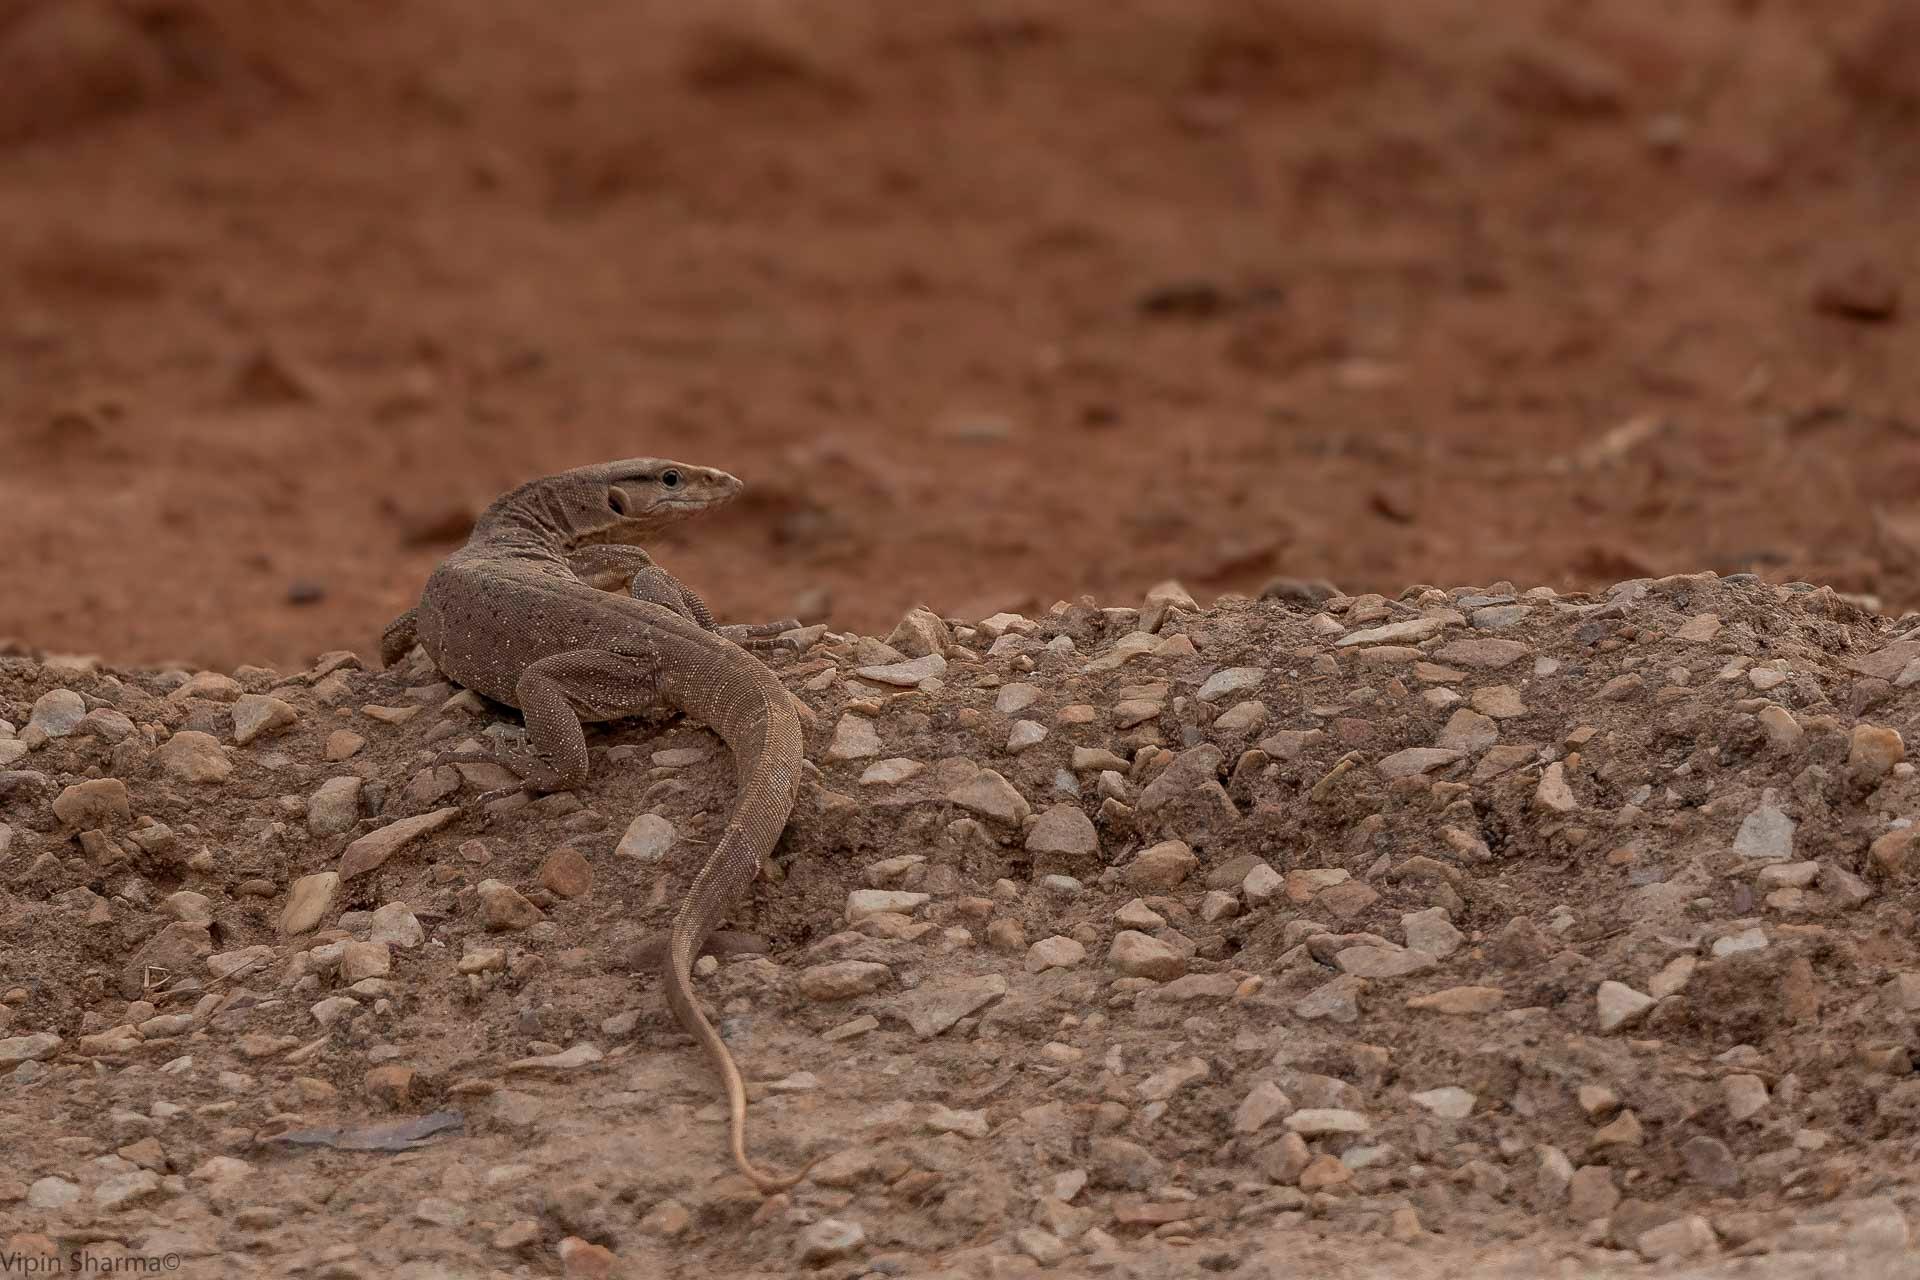 Monitor Lizard by vipin.sharma